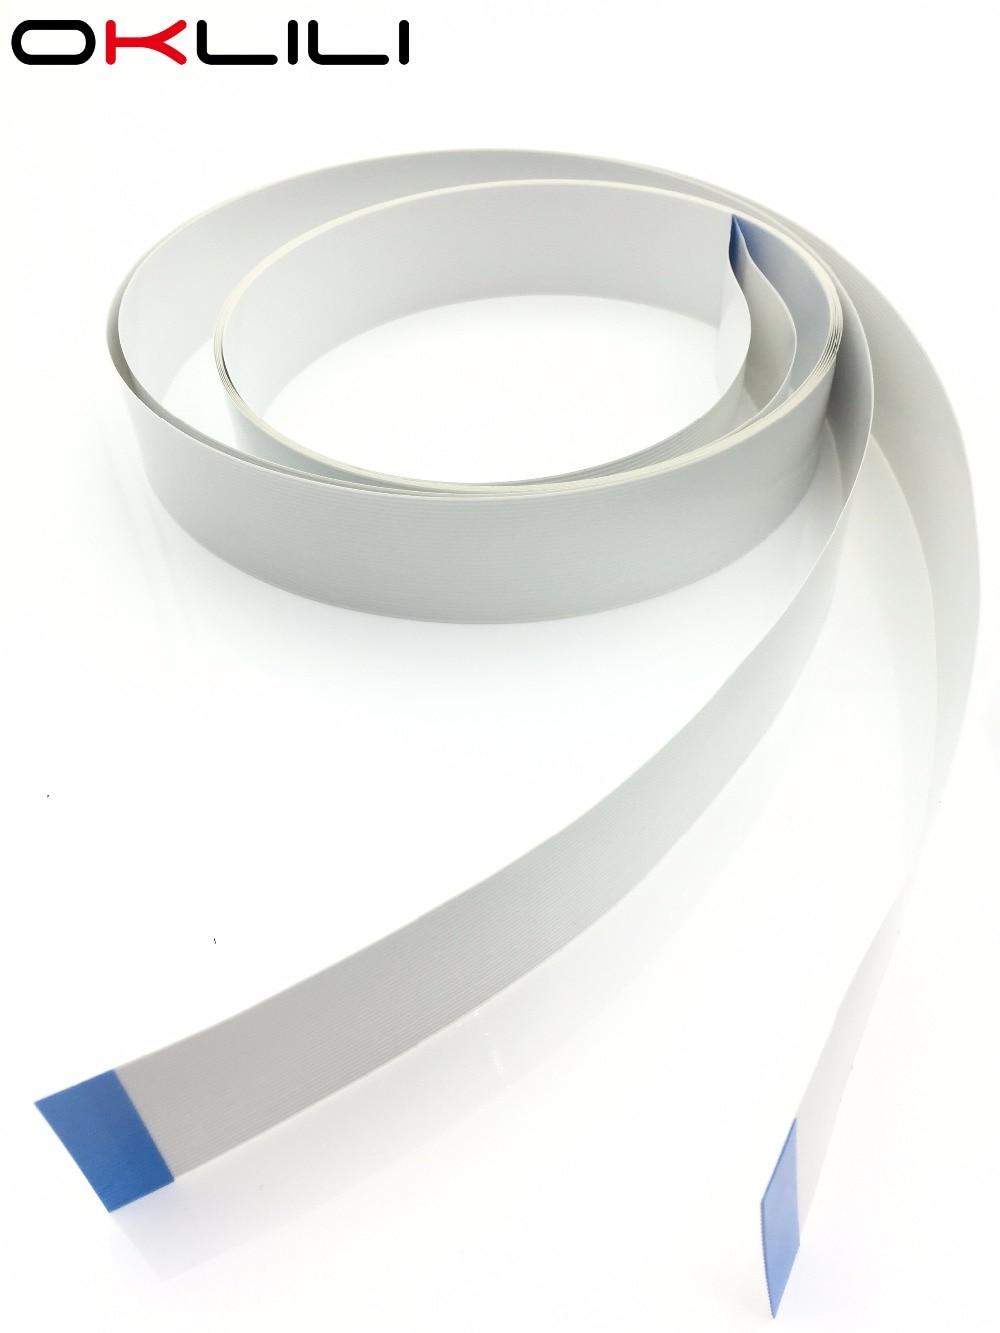 conjunto 10 c7770 60147 c7770 60274 c7770 60258 plano trailing cable 42 b0 para hp designjet